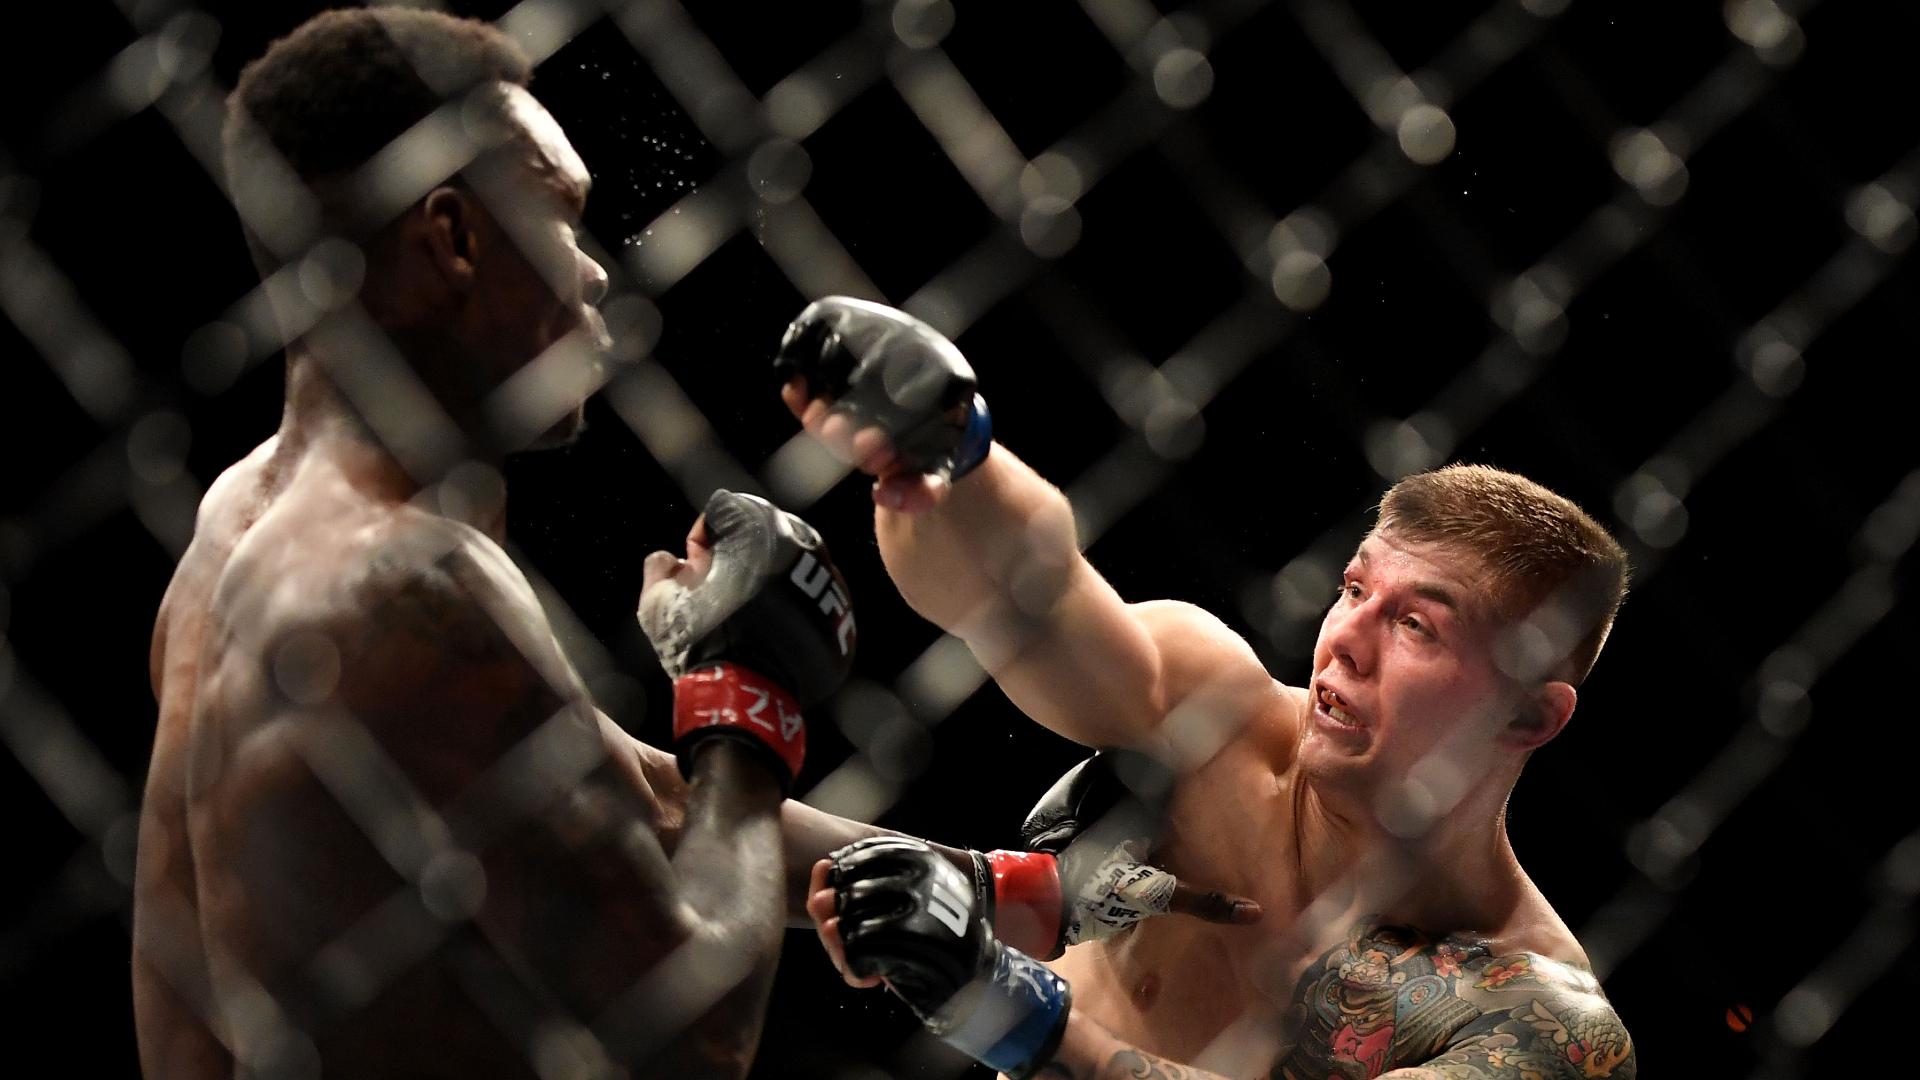 Israel Adesanya vs. Marvin Vettori bag, salaries: How much money will they win at UFC 263?